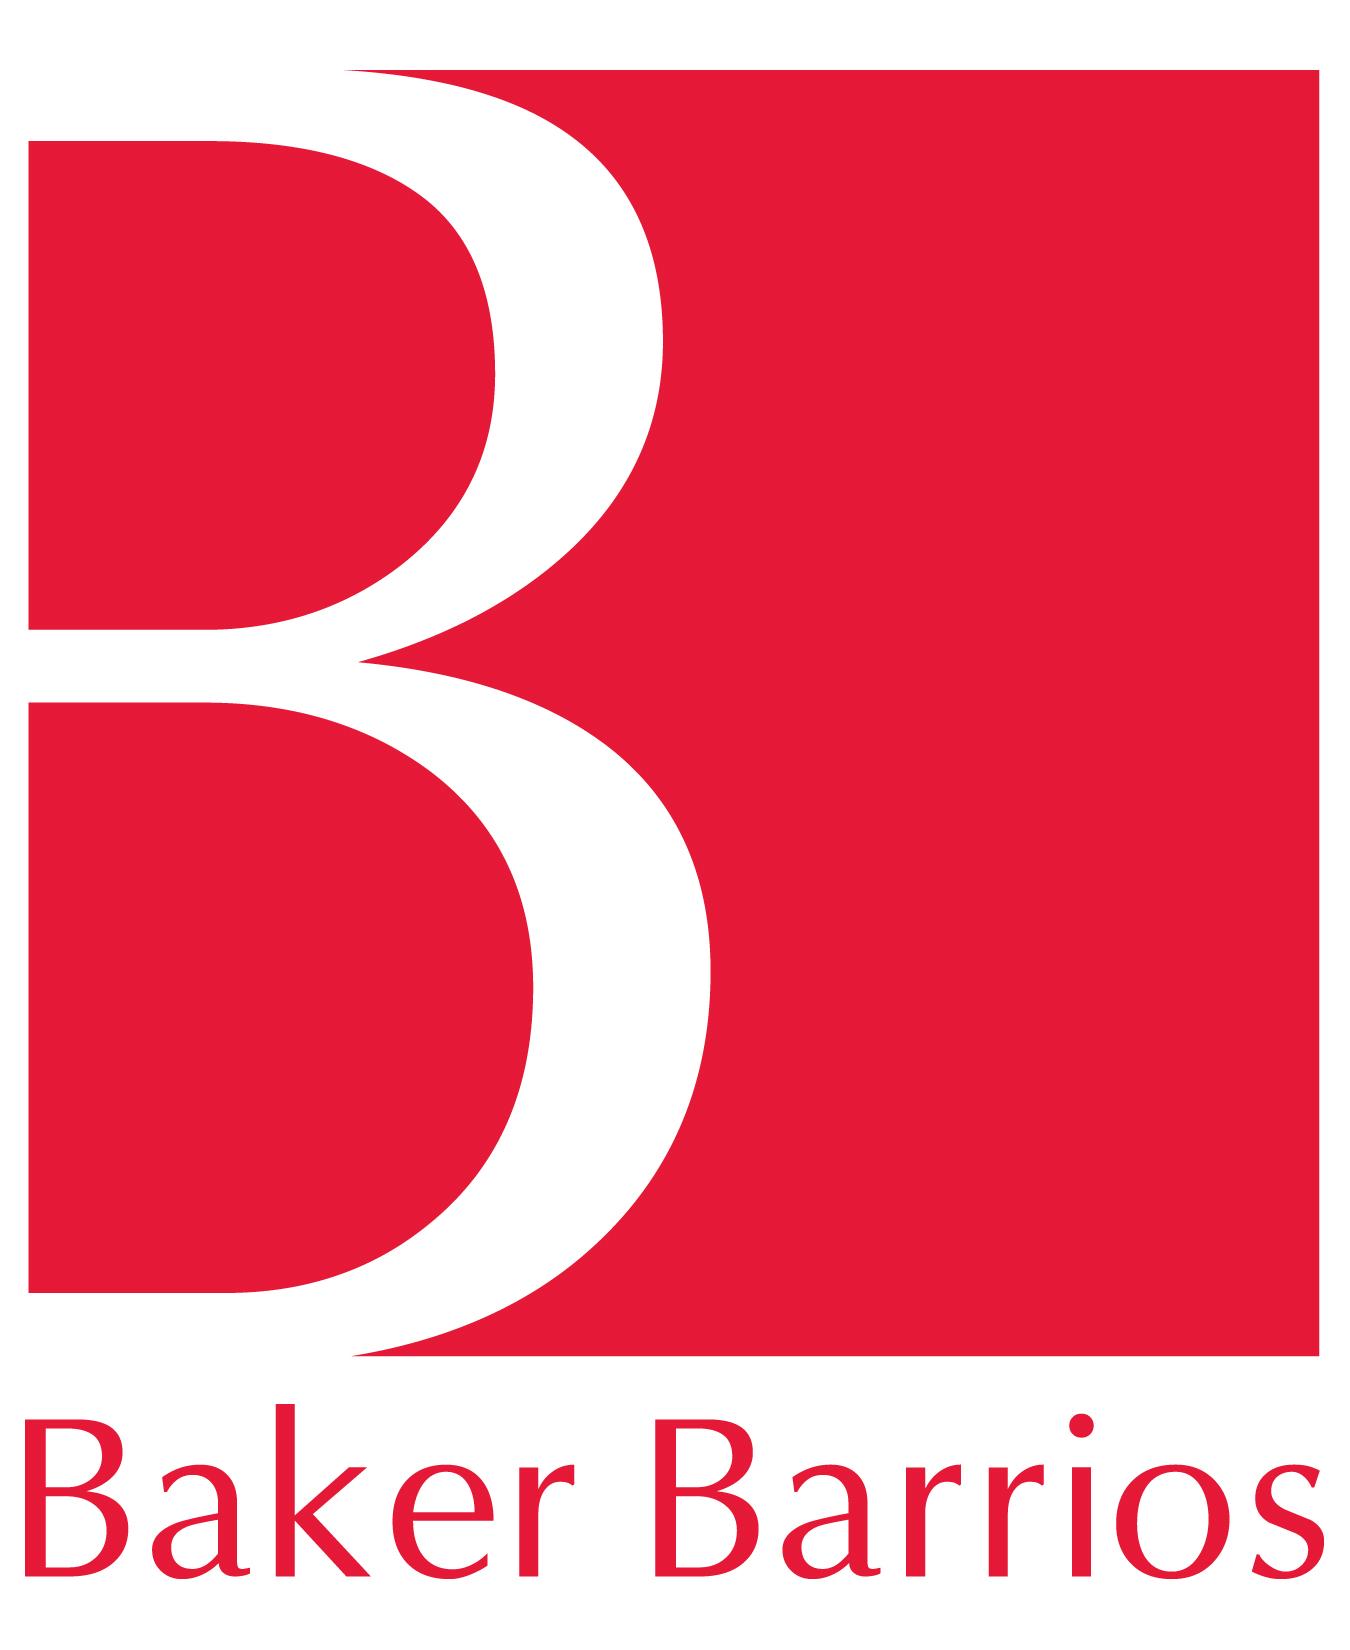 Baker Barrios